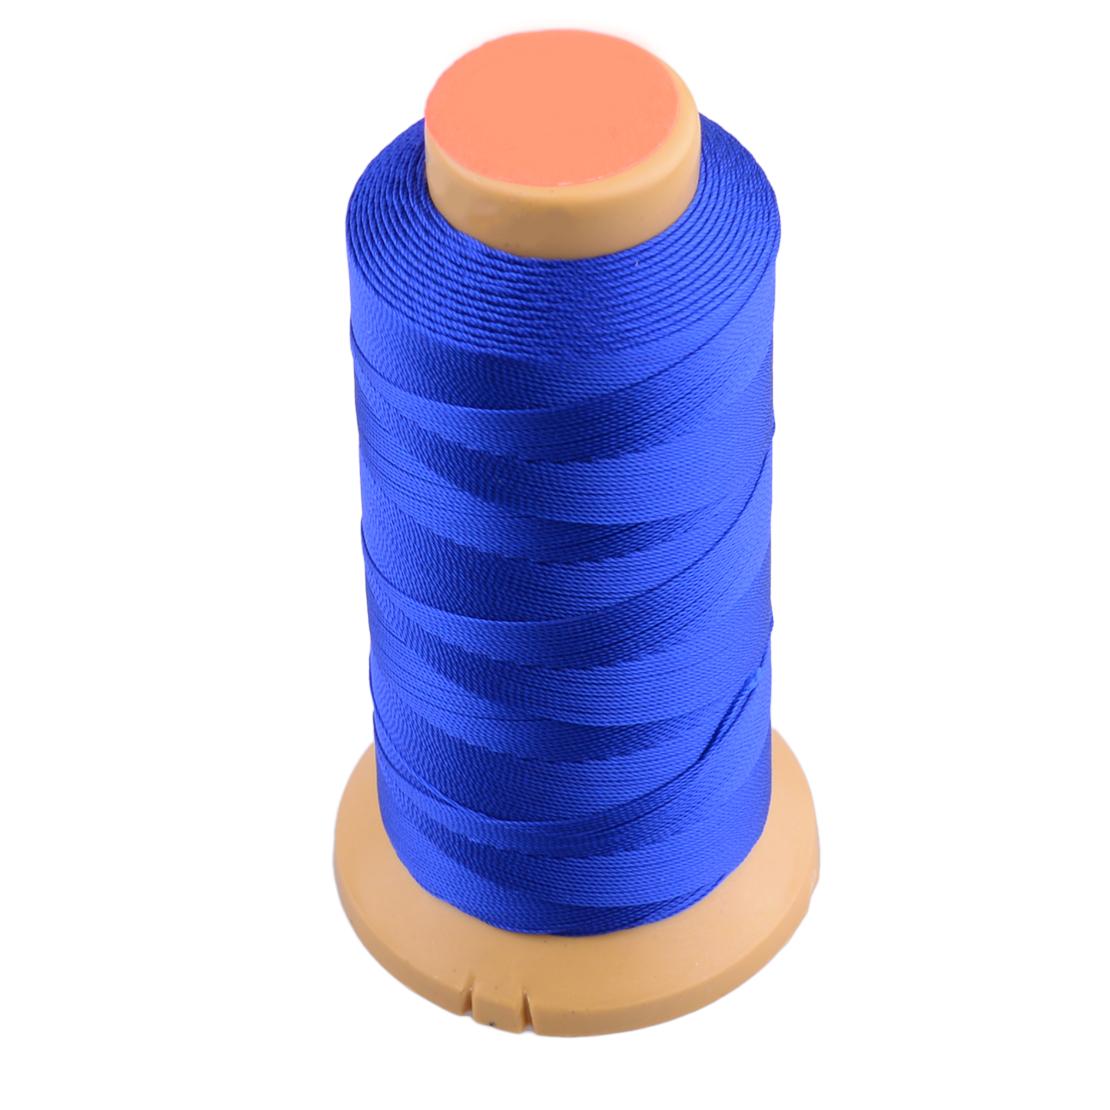 480m-Nylon-Silk-Beading-Thread-String-Cord-Spool-Stringing-beads-Tassel-0-4mm